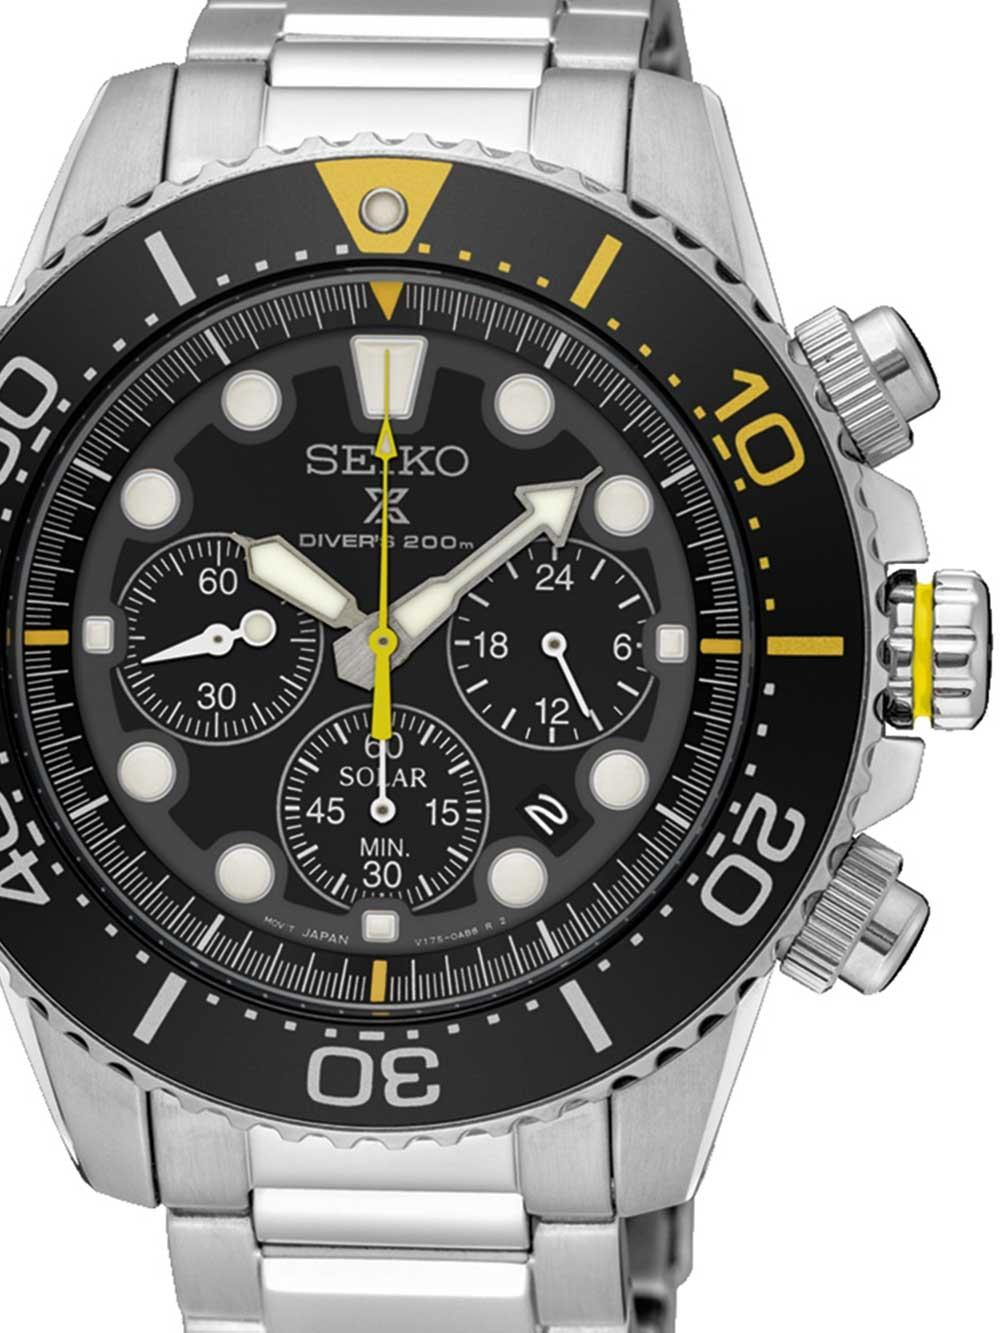 SSC613P1 Prospex Solar Diver Chronograph 43mm 20ATM